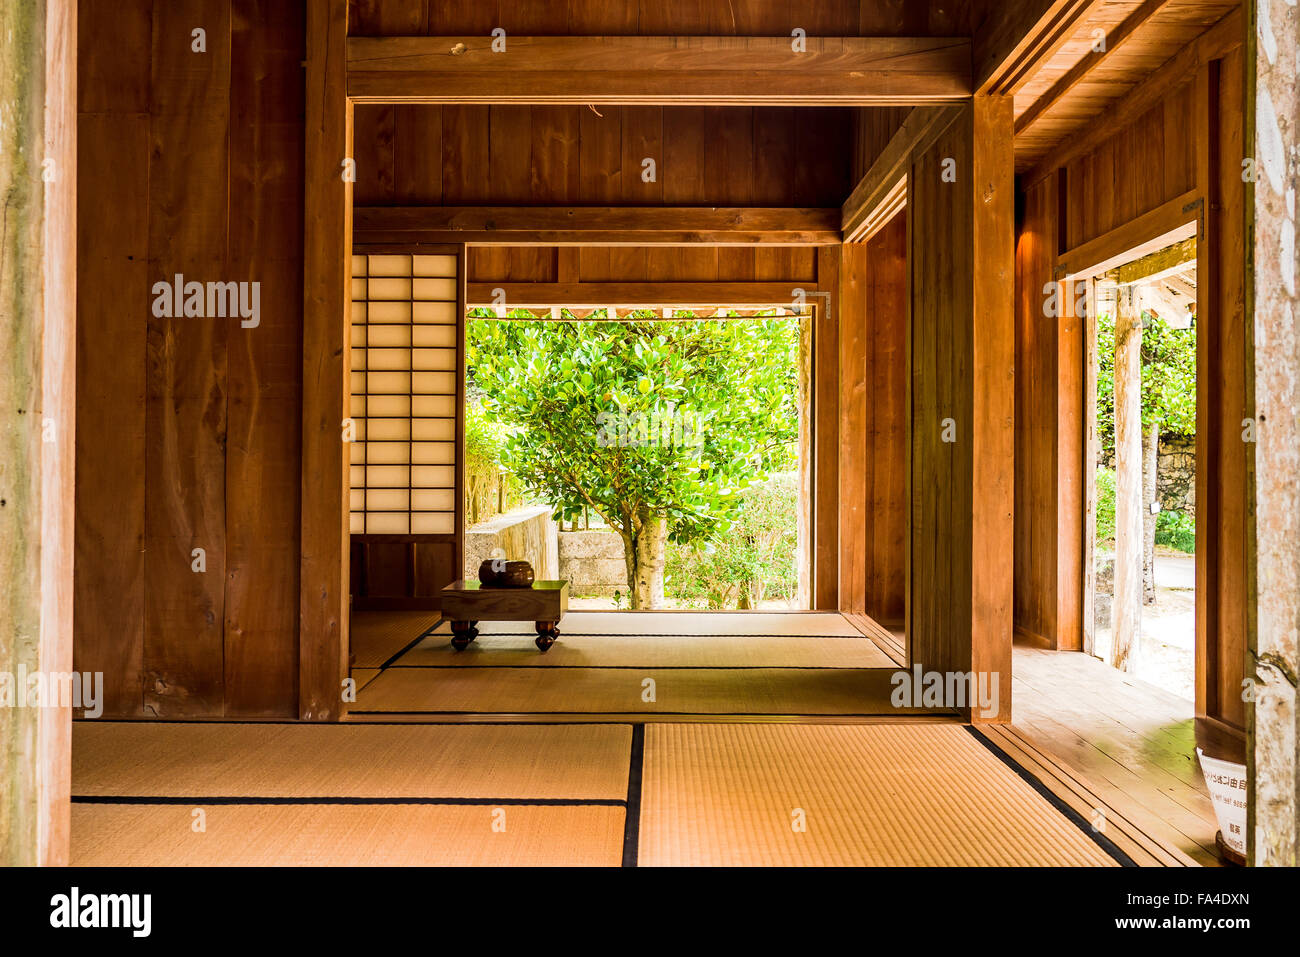 Traditional Okinawan home at open air museum near Okinawa Churaumi Aquarium, Japan - Stock Image